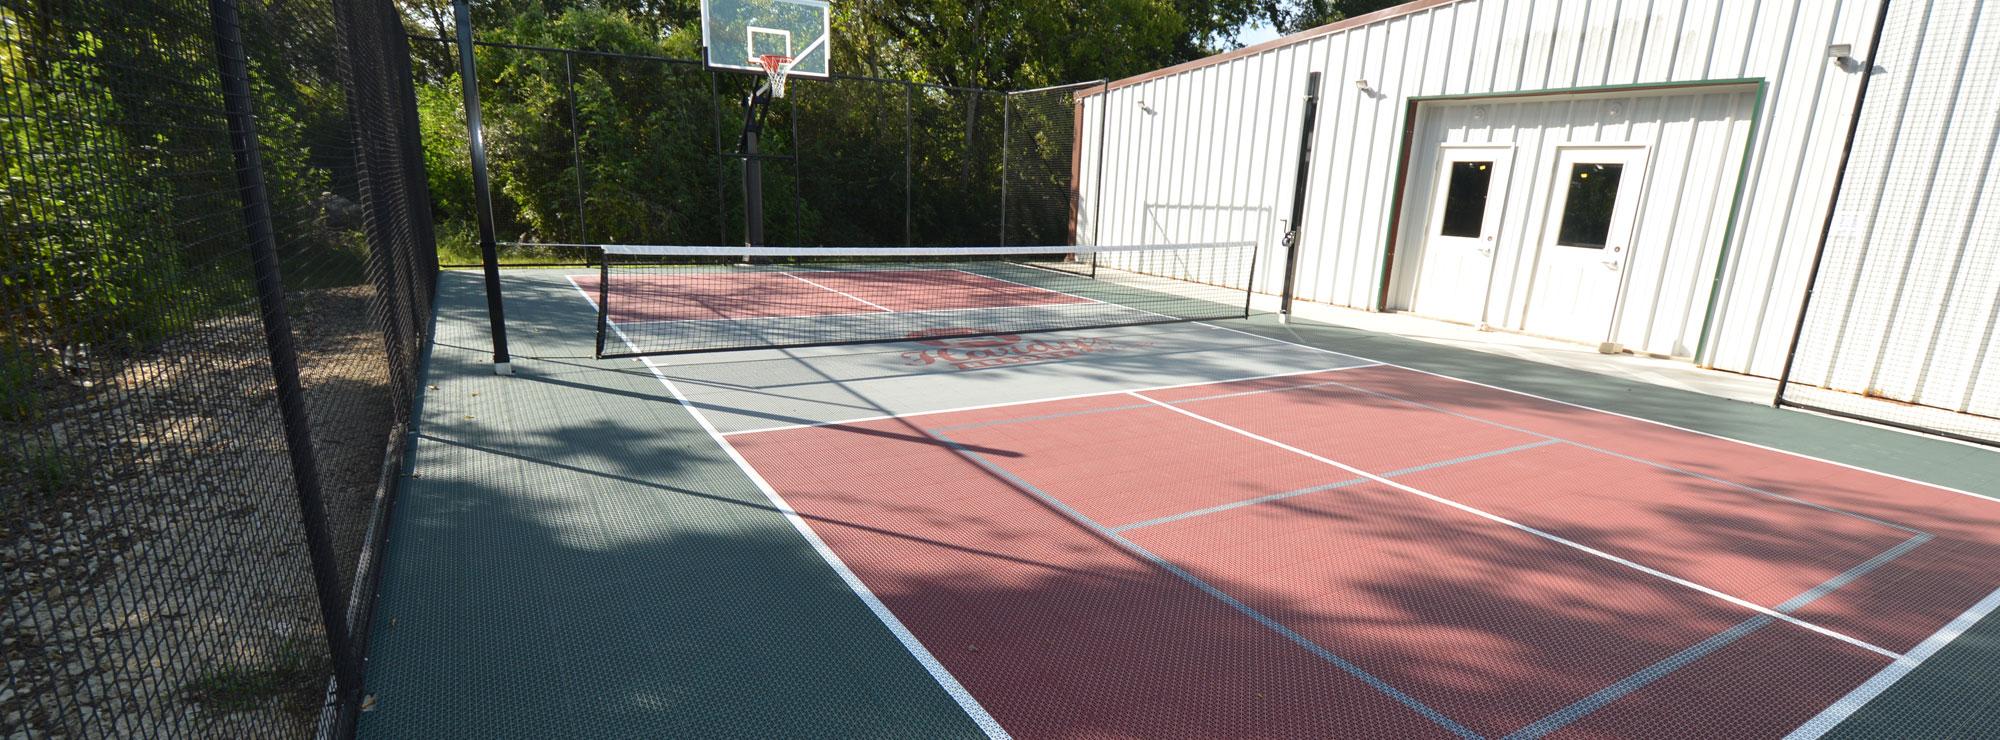 tennis_basketball